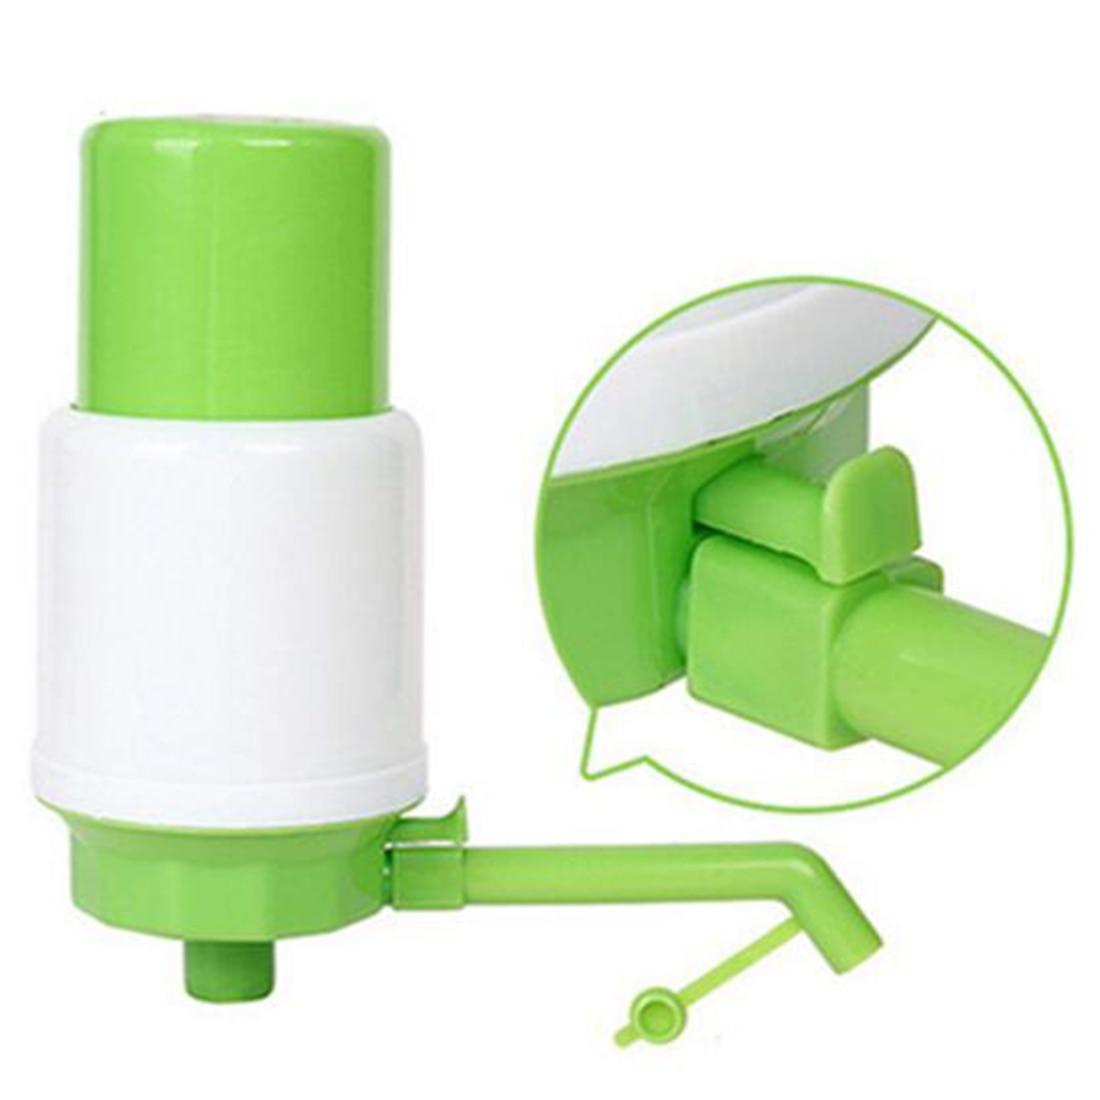 Best Seller Random Color Household Manual Water Bottle/Jug Hand Pump Hand Press Dispenser 4